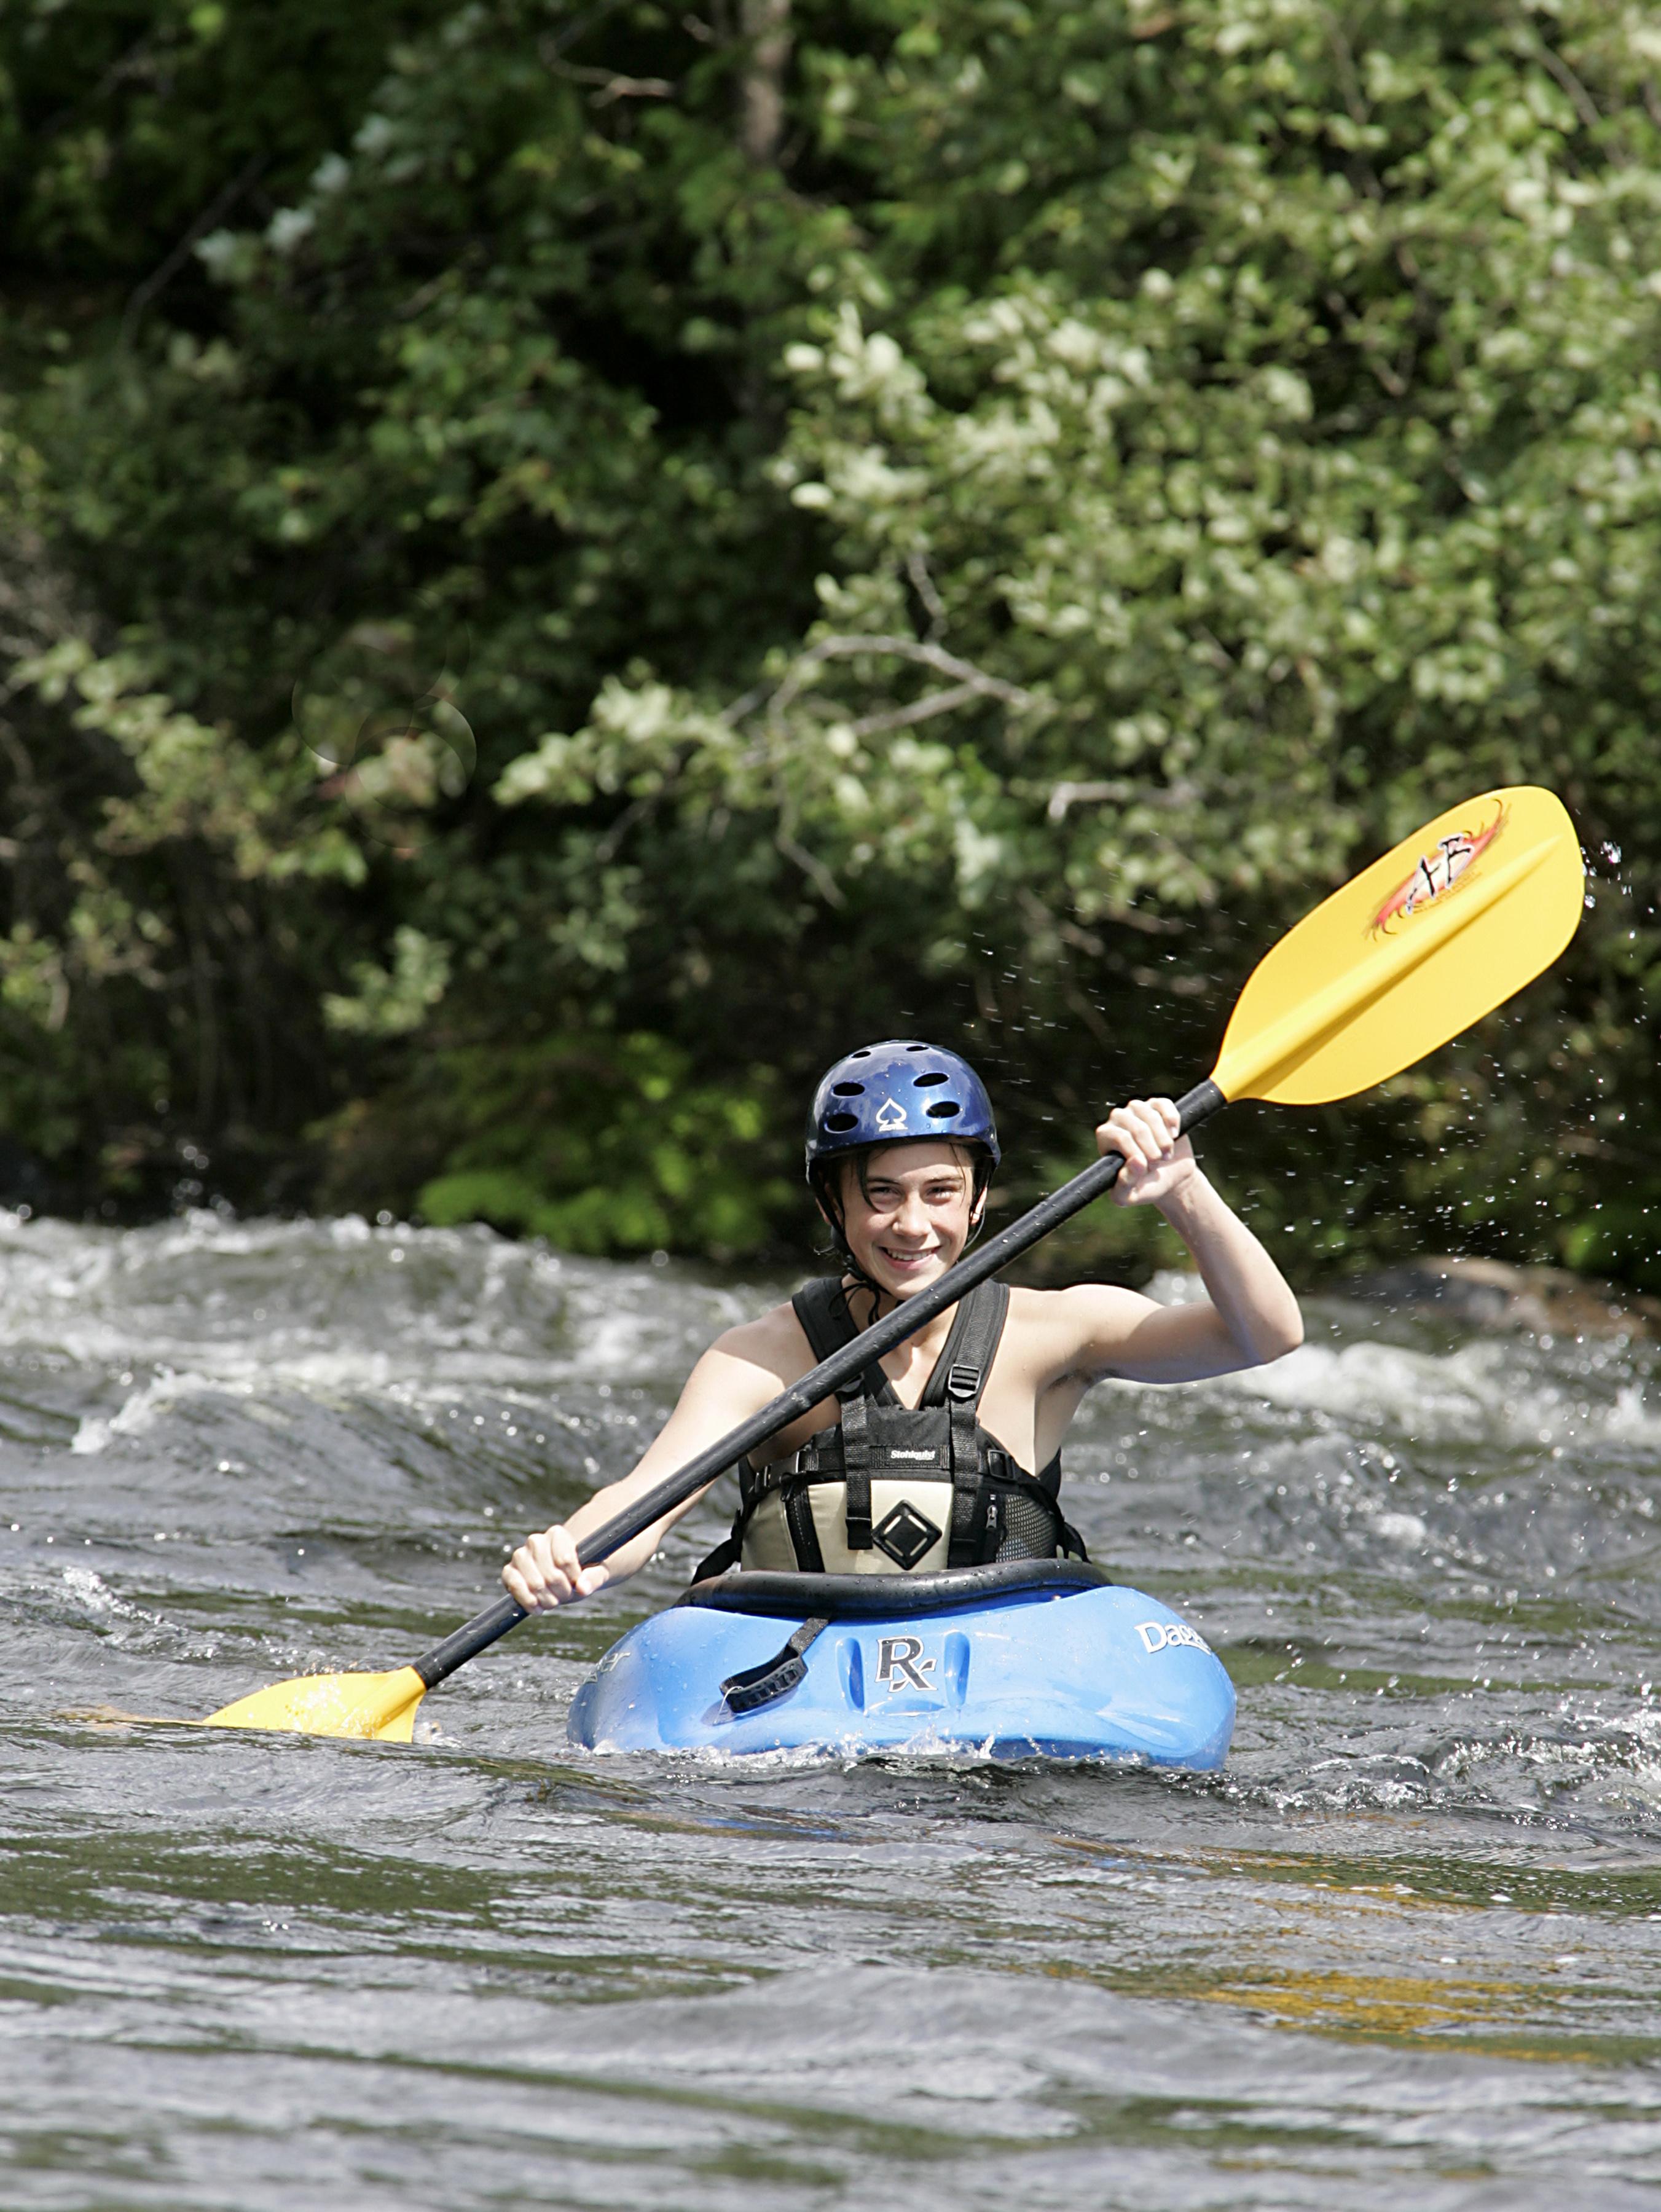 Summer Program - Kayaking   AMC's Teen Wilderness Adventures: 7-Day Rocks & Rivers Adventure (Ages 15-18)